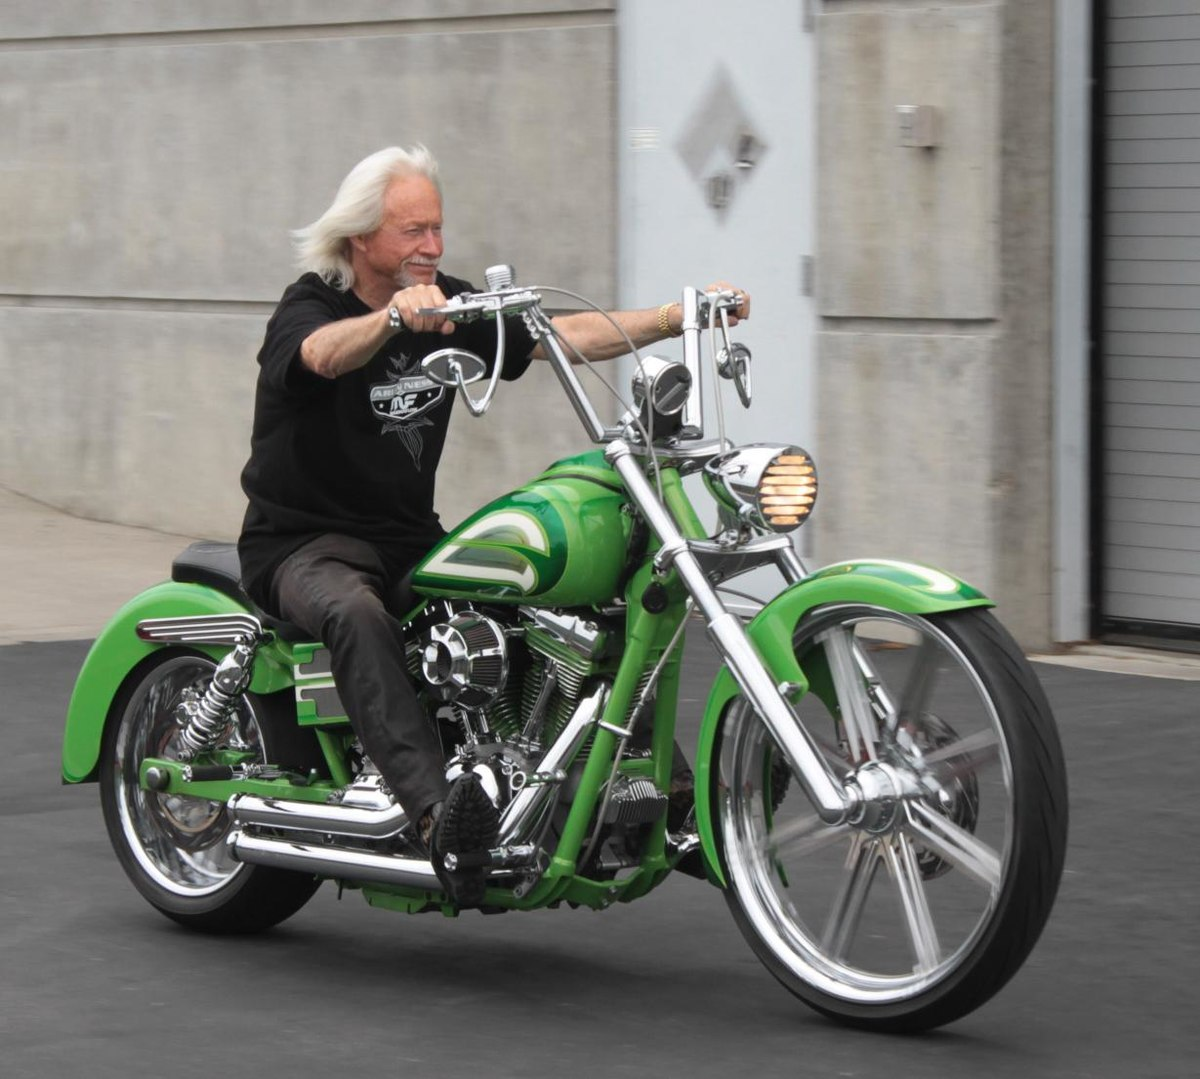 Best Motorcycle Body Armor